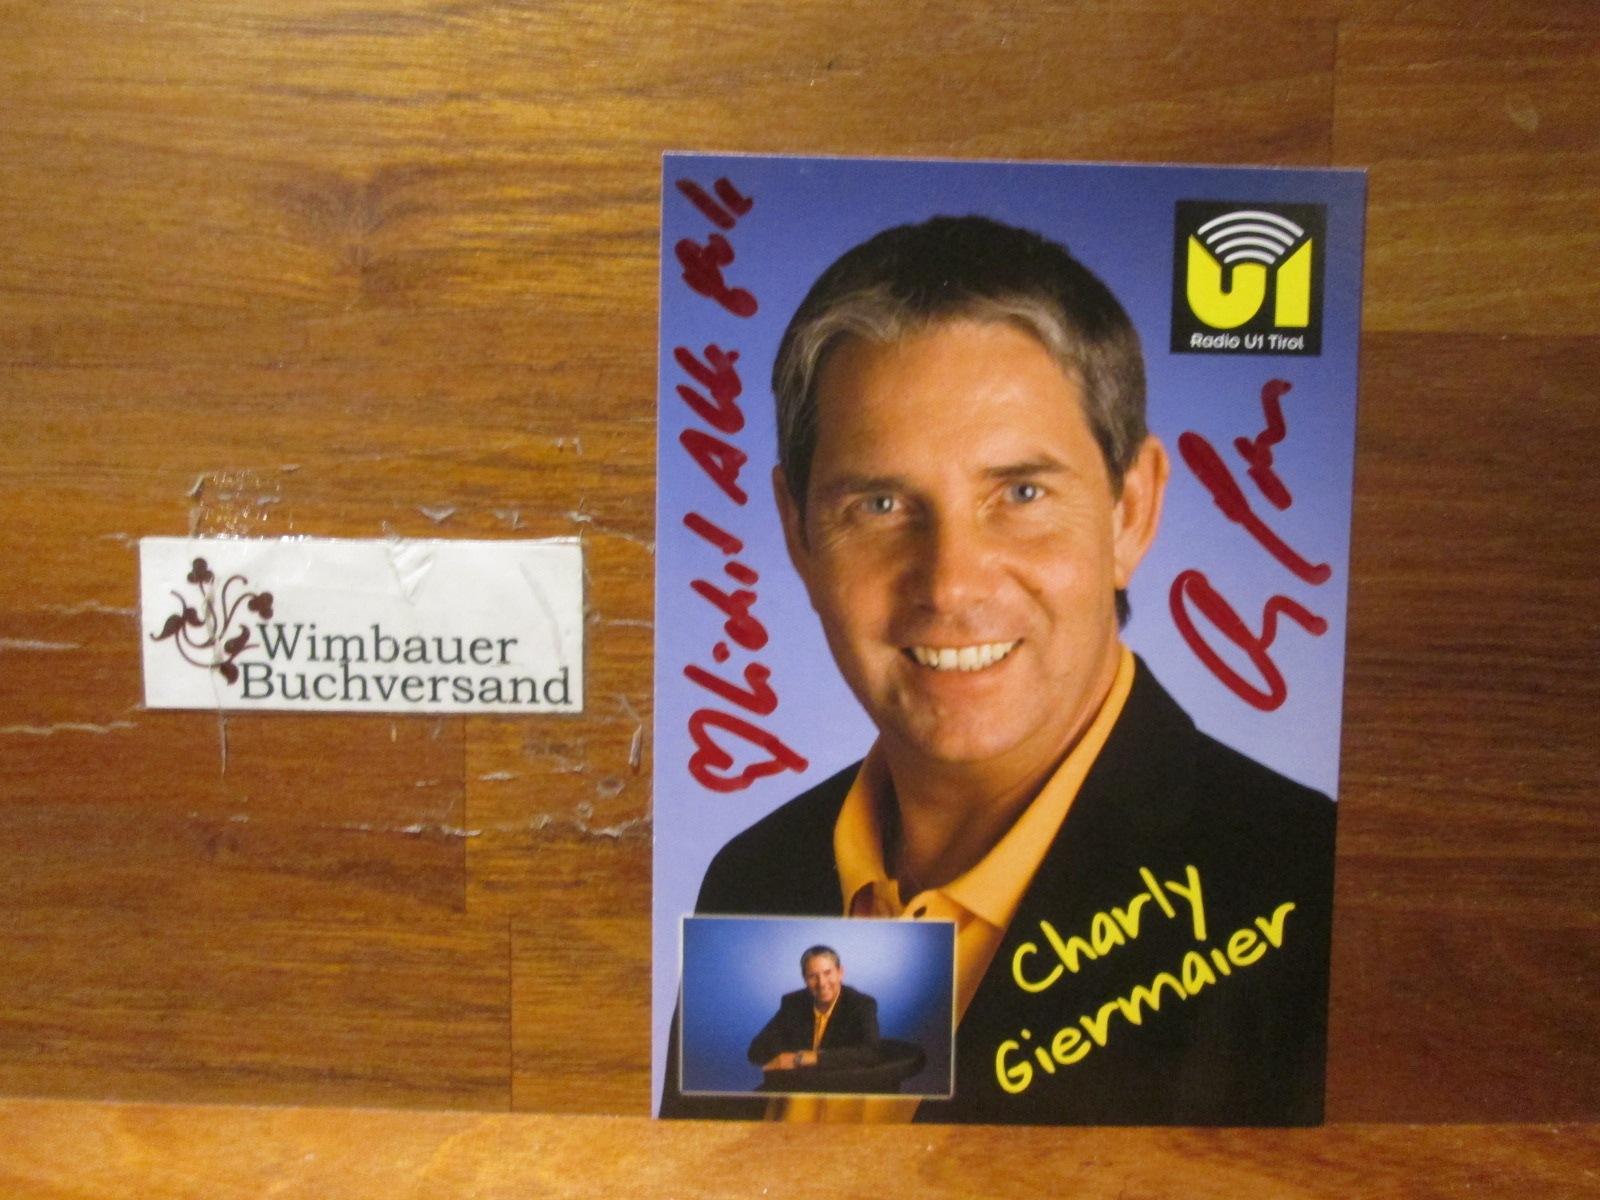 Original Autogramm Charly Giermaier Radio U1 Tirol /// Autogramm Autograph signiert signed signee